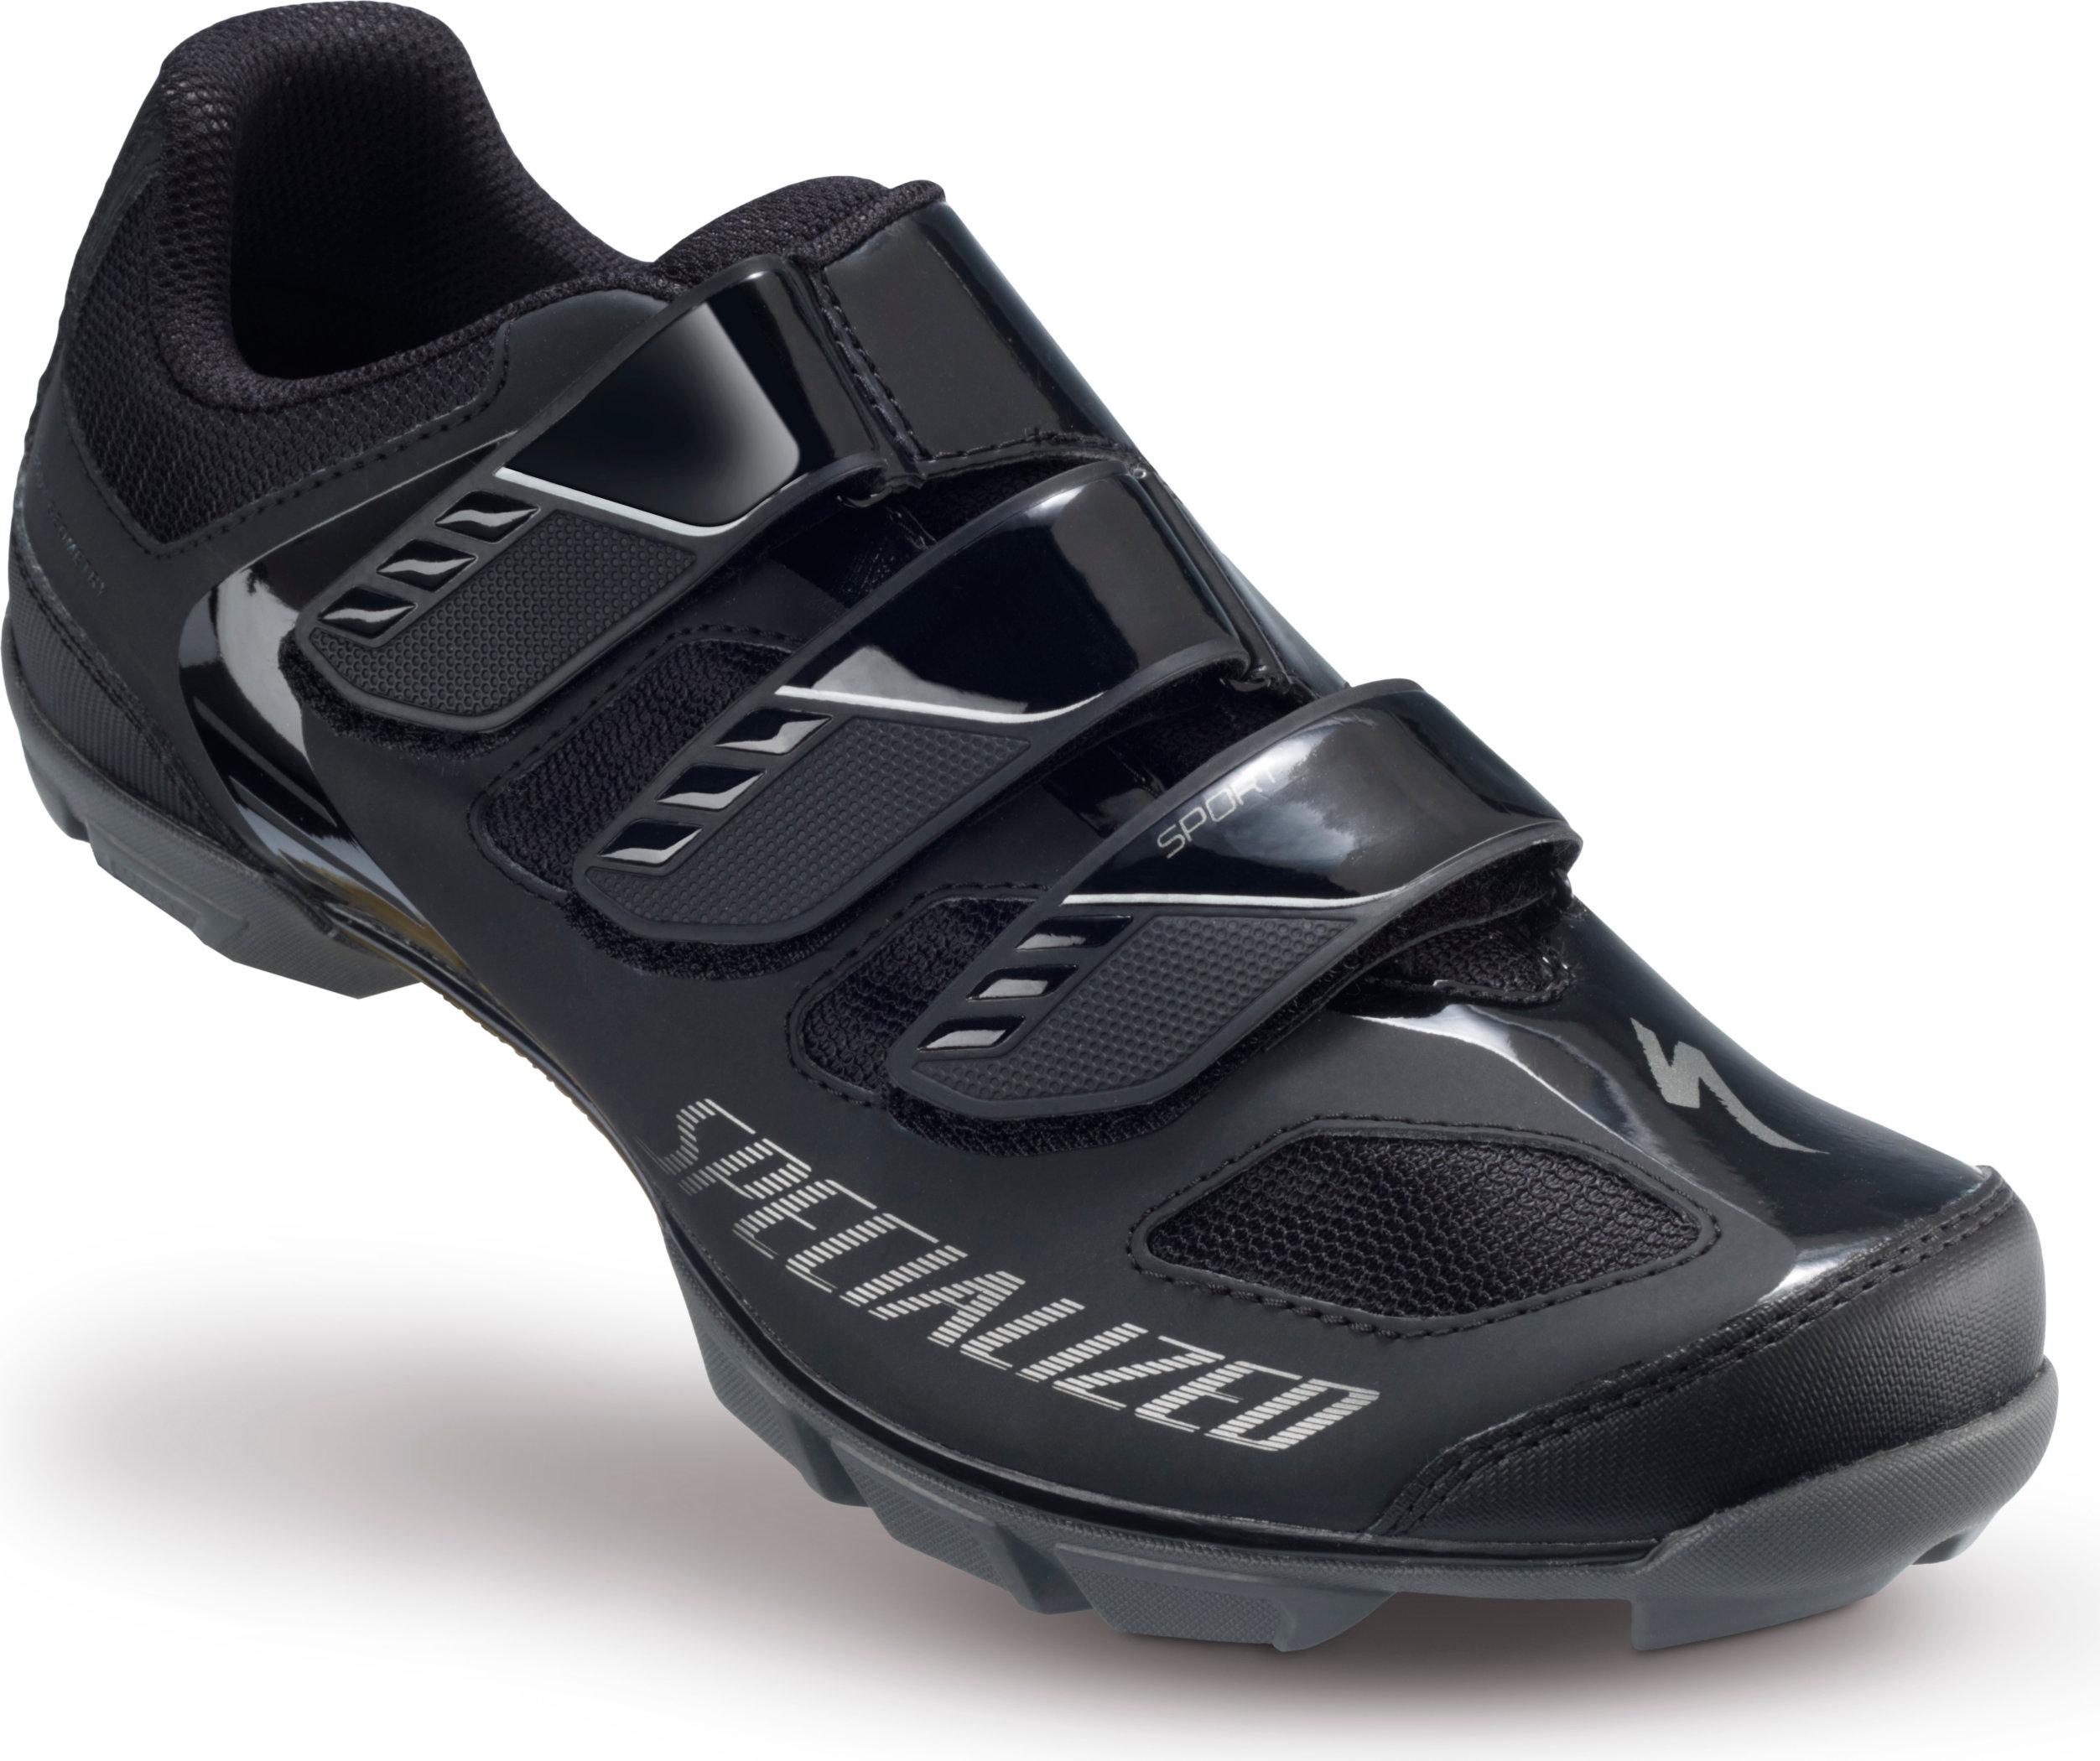 Specialized Sport MTB Black/Black 39/6.5 - Alpha Bikes